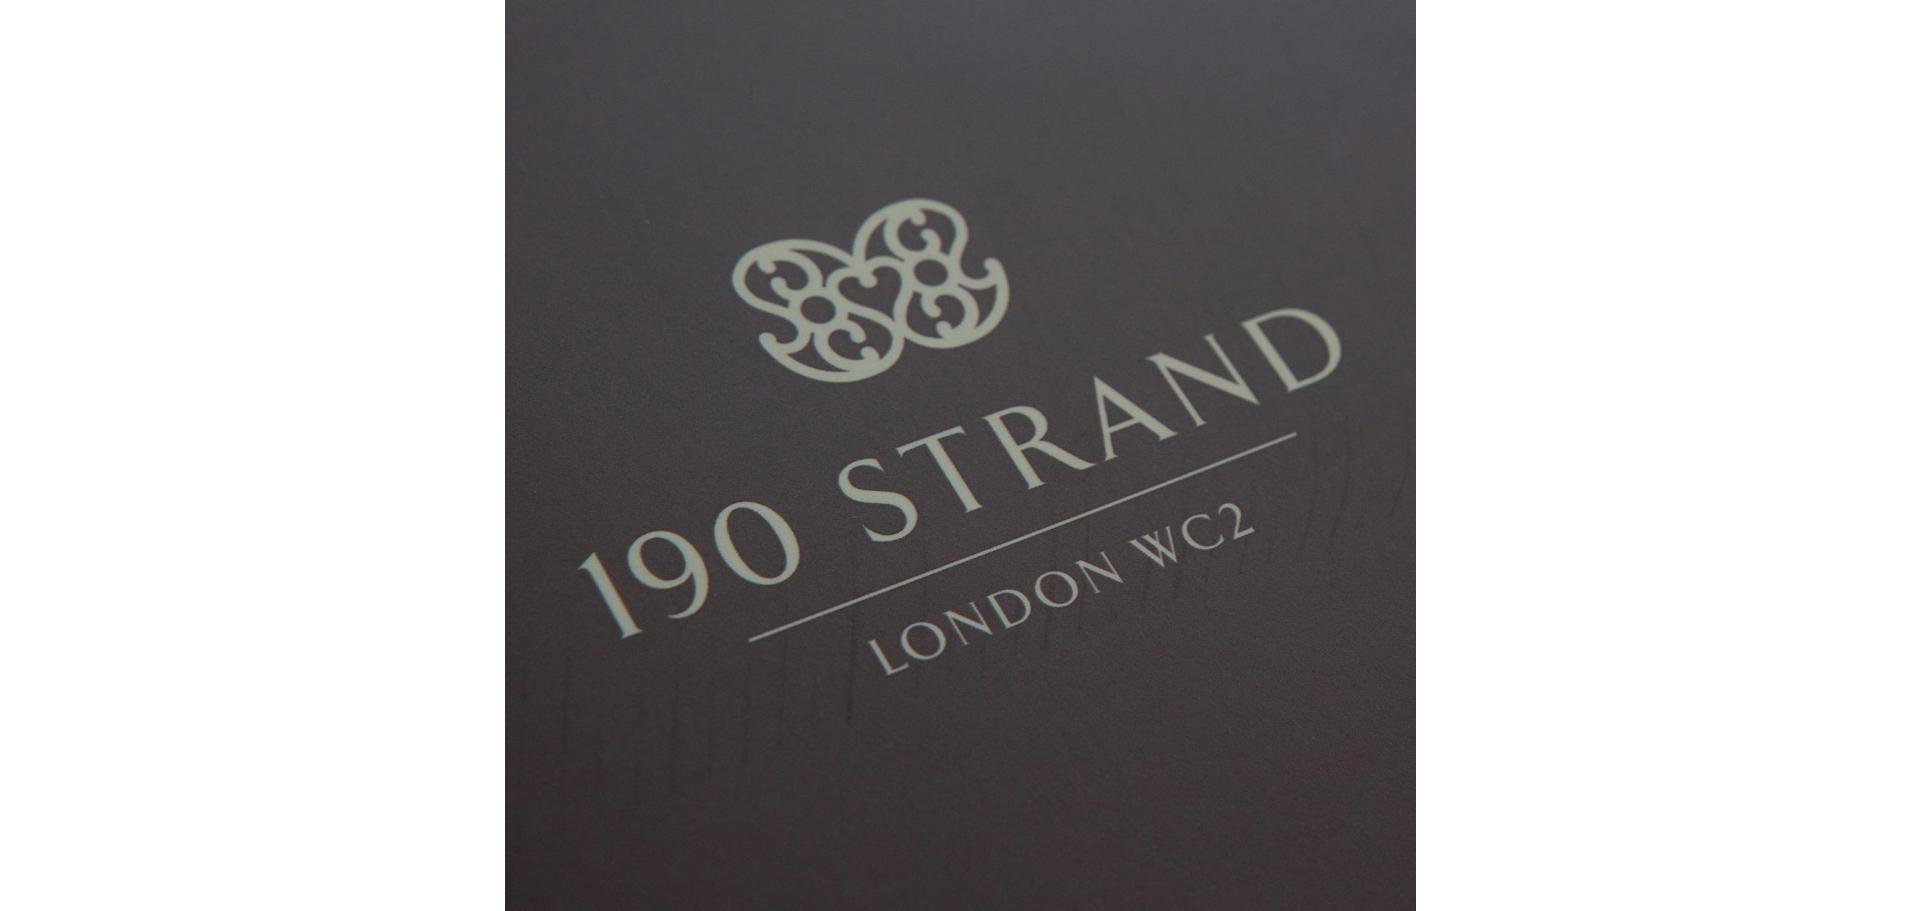 190-strand